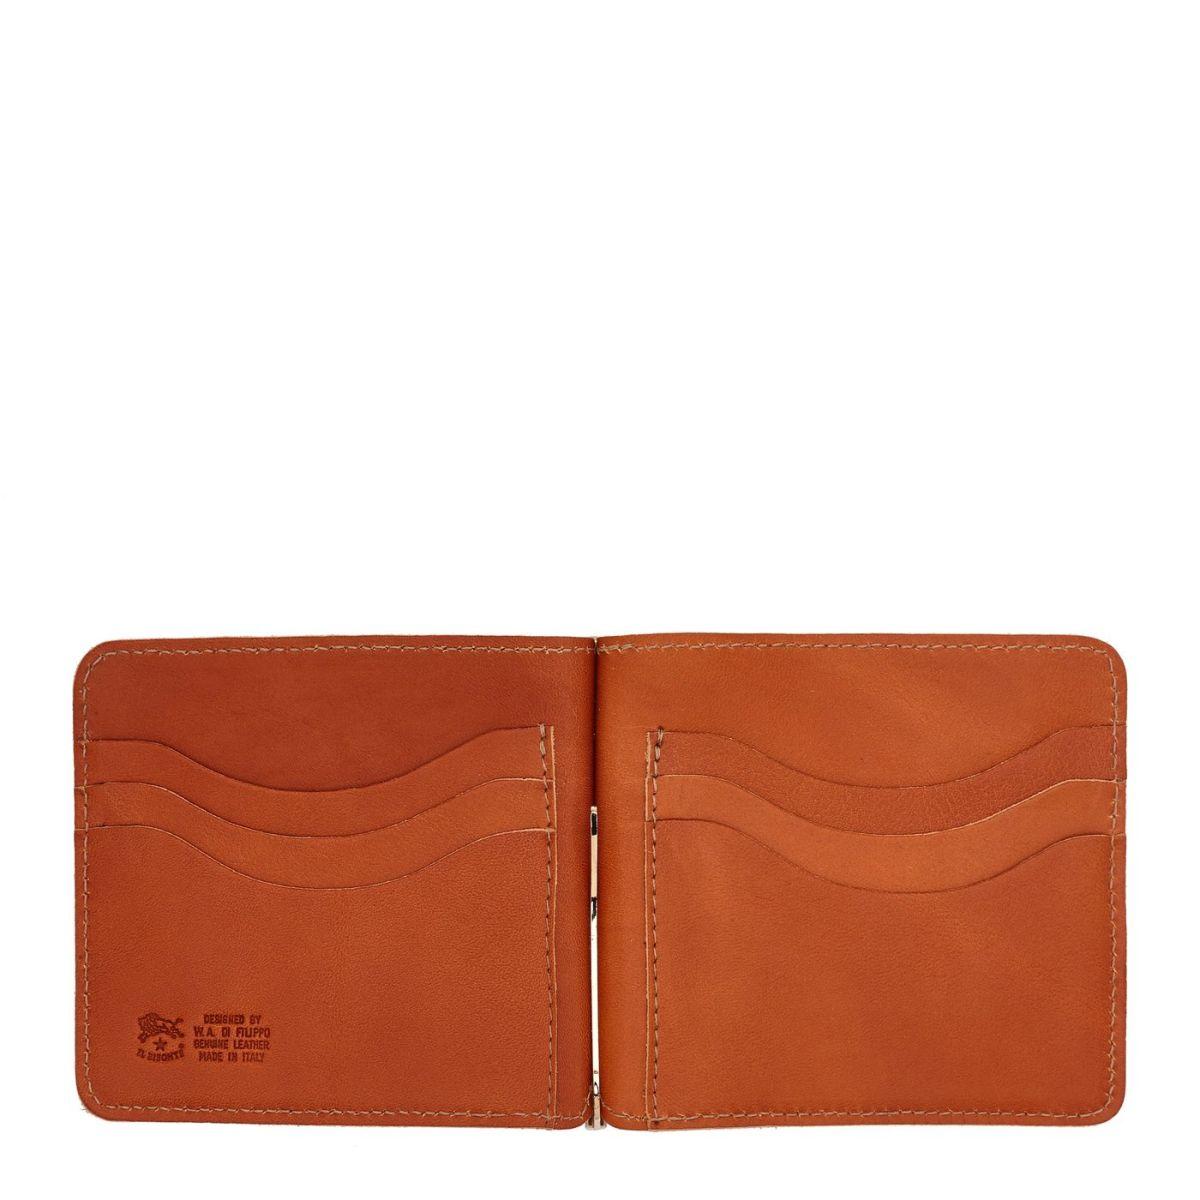 Men's Wallet  in Cowhide Double Leather SMW076 color Caramel | Details